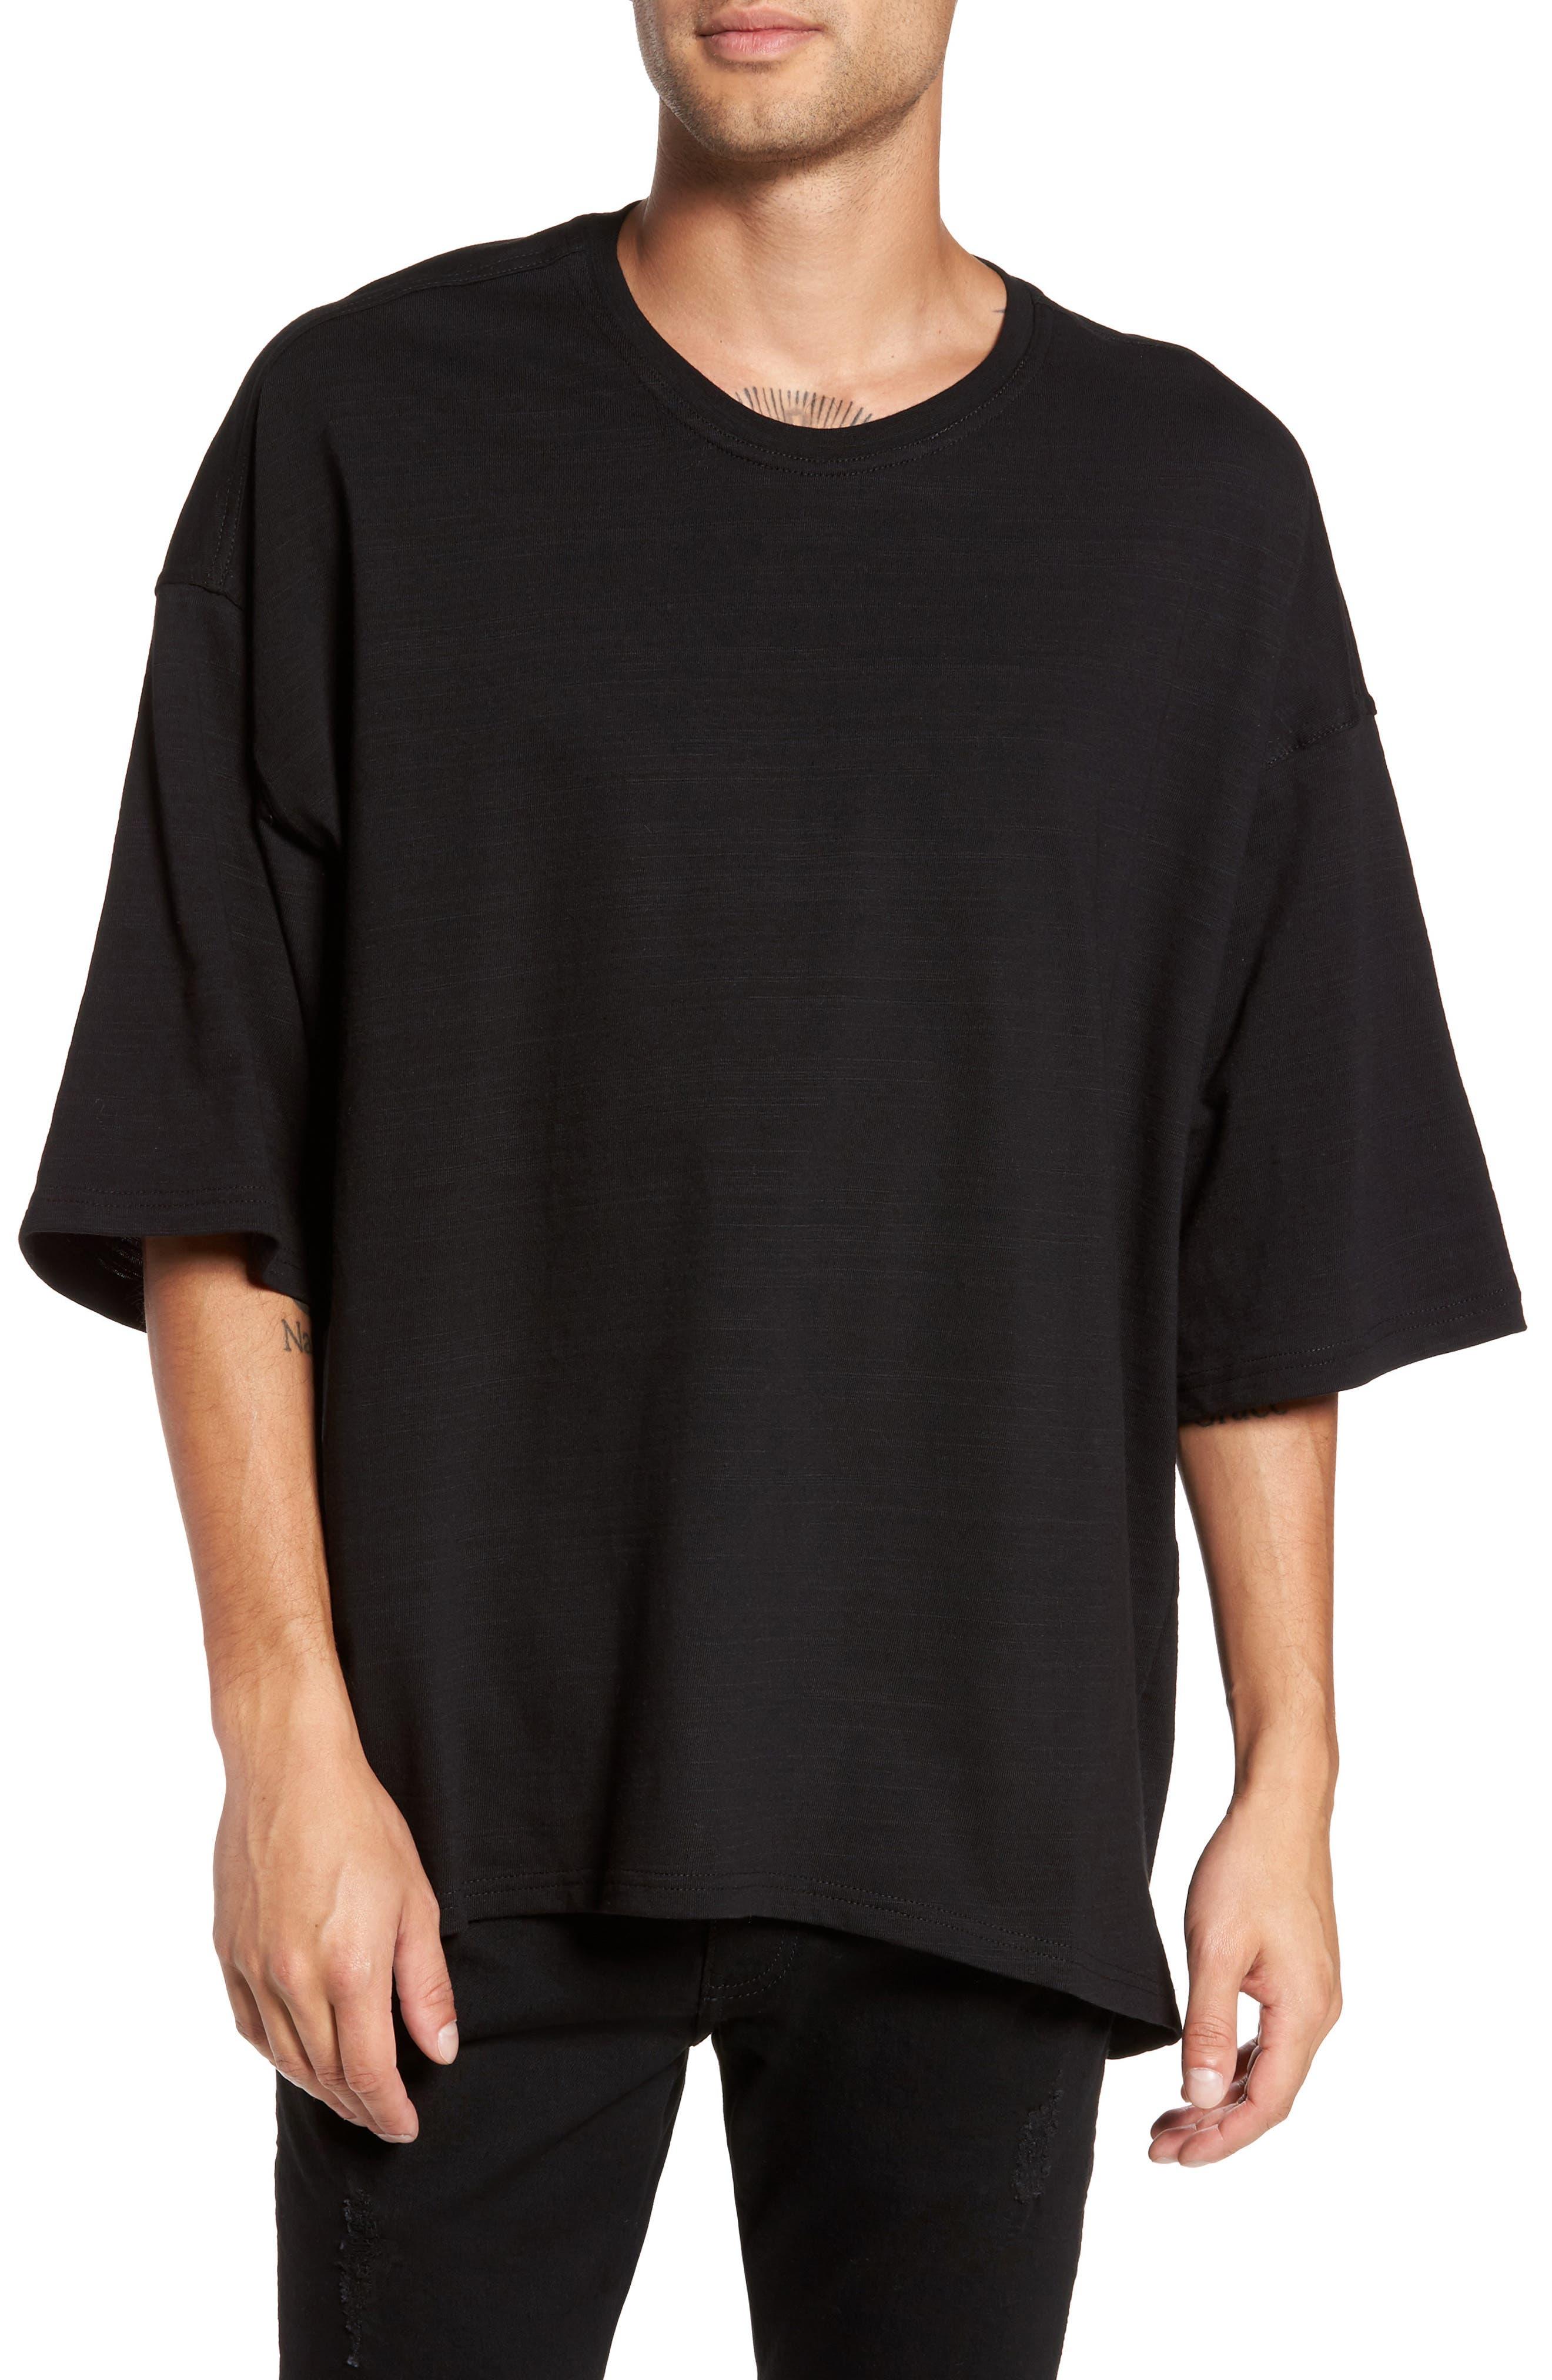 Represent Relaxed Fit Crewneck T-Shirt